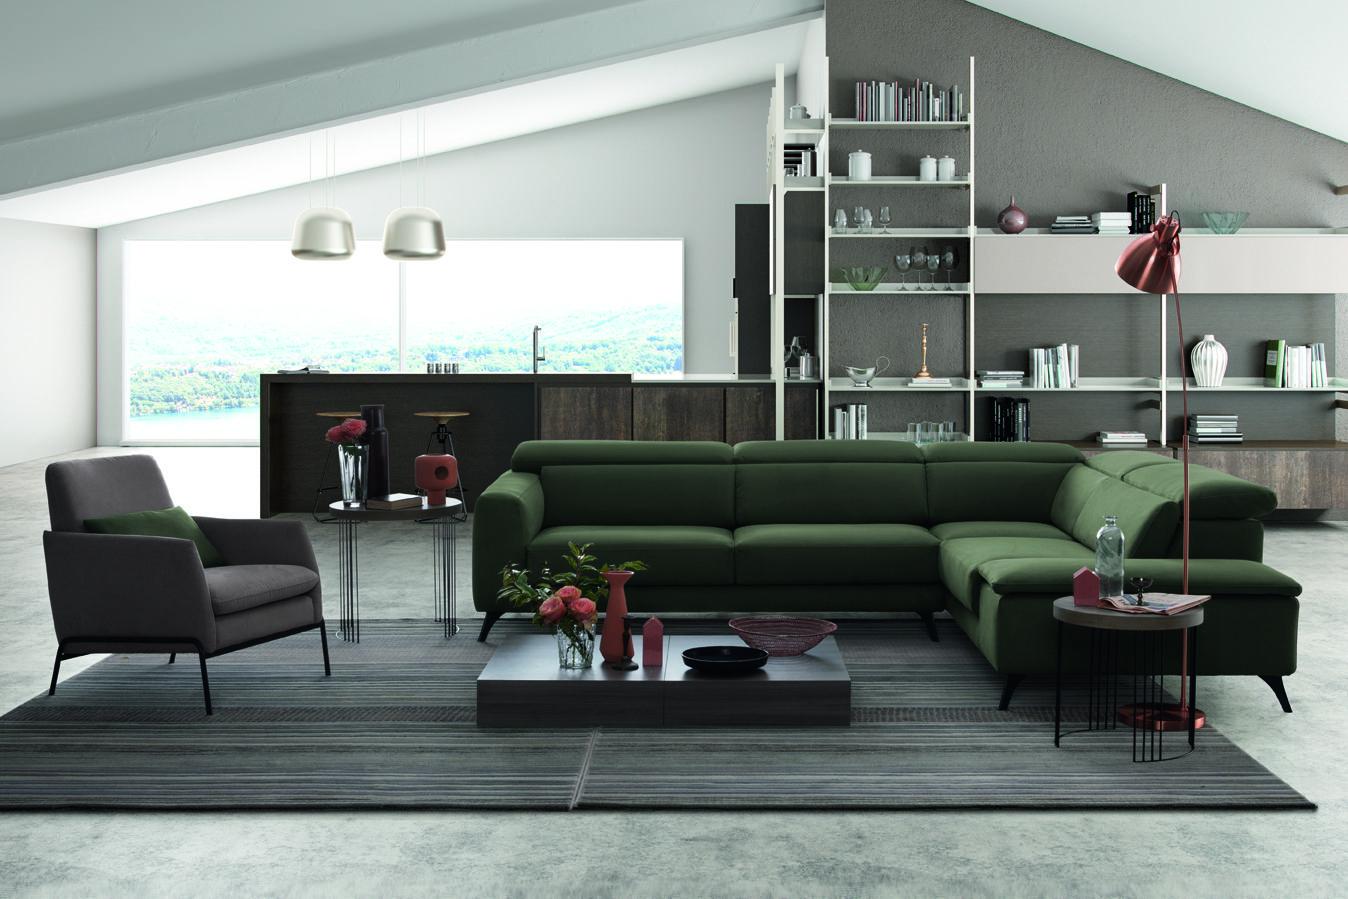 Divani Febal Casa | Awesome Divani E Divani Pesaro Contemporary Home ...